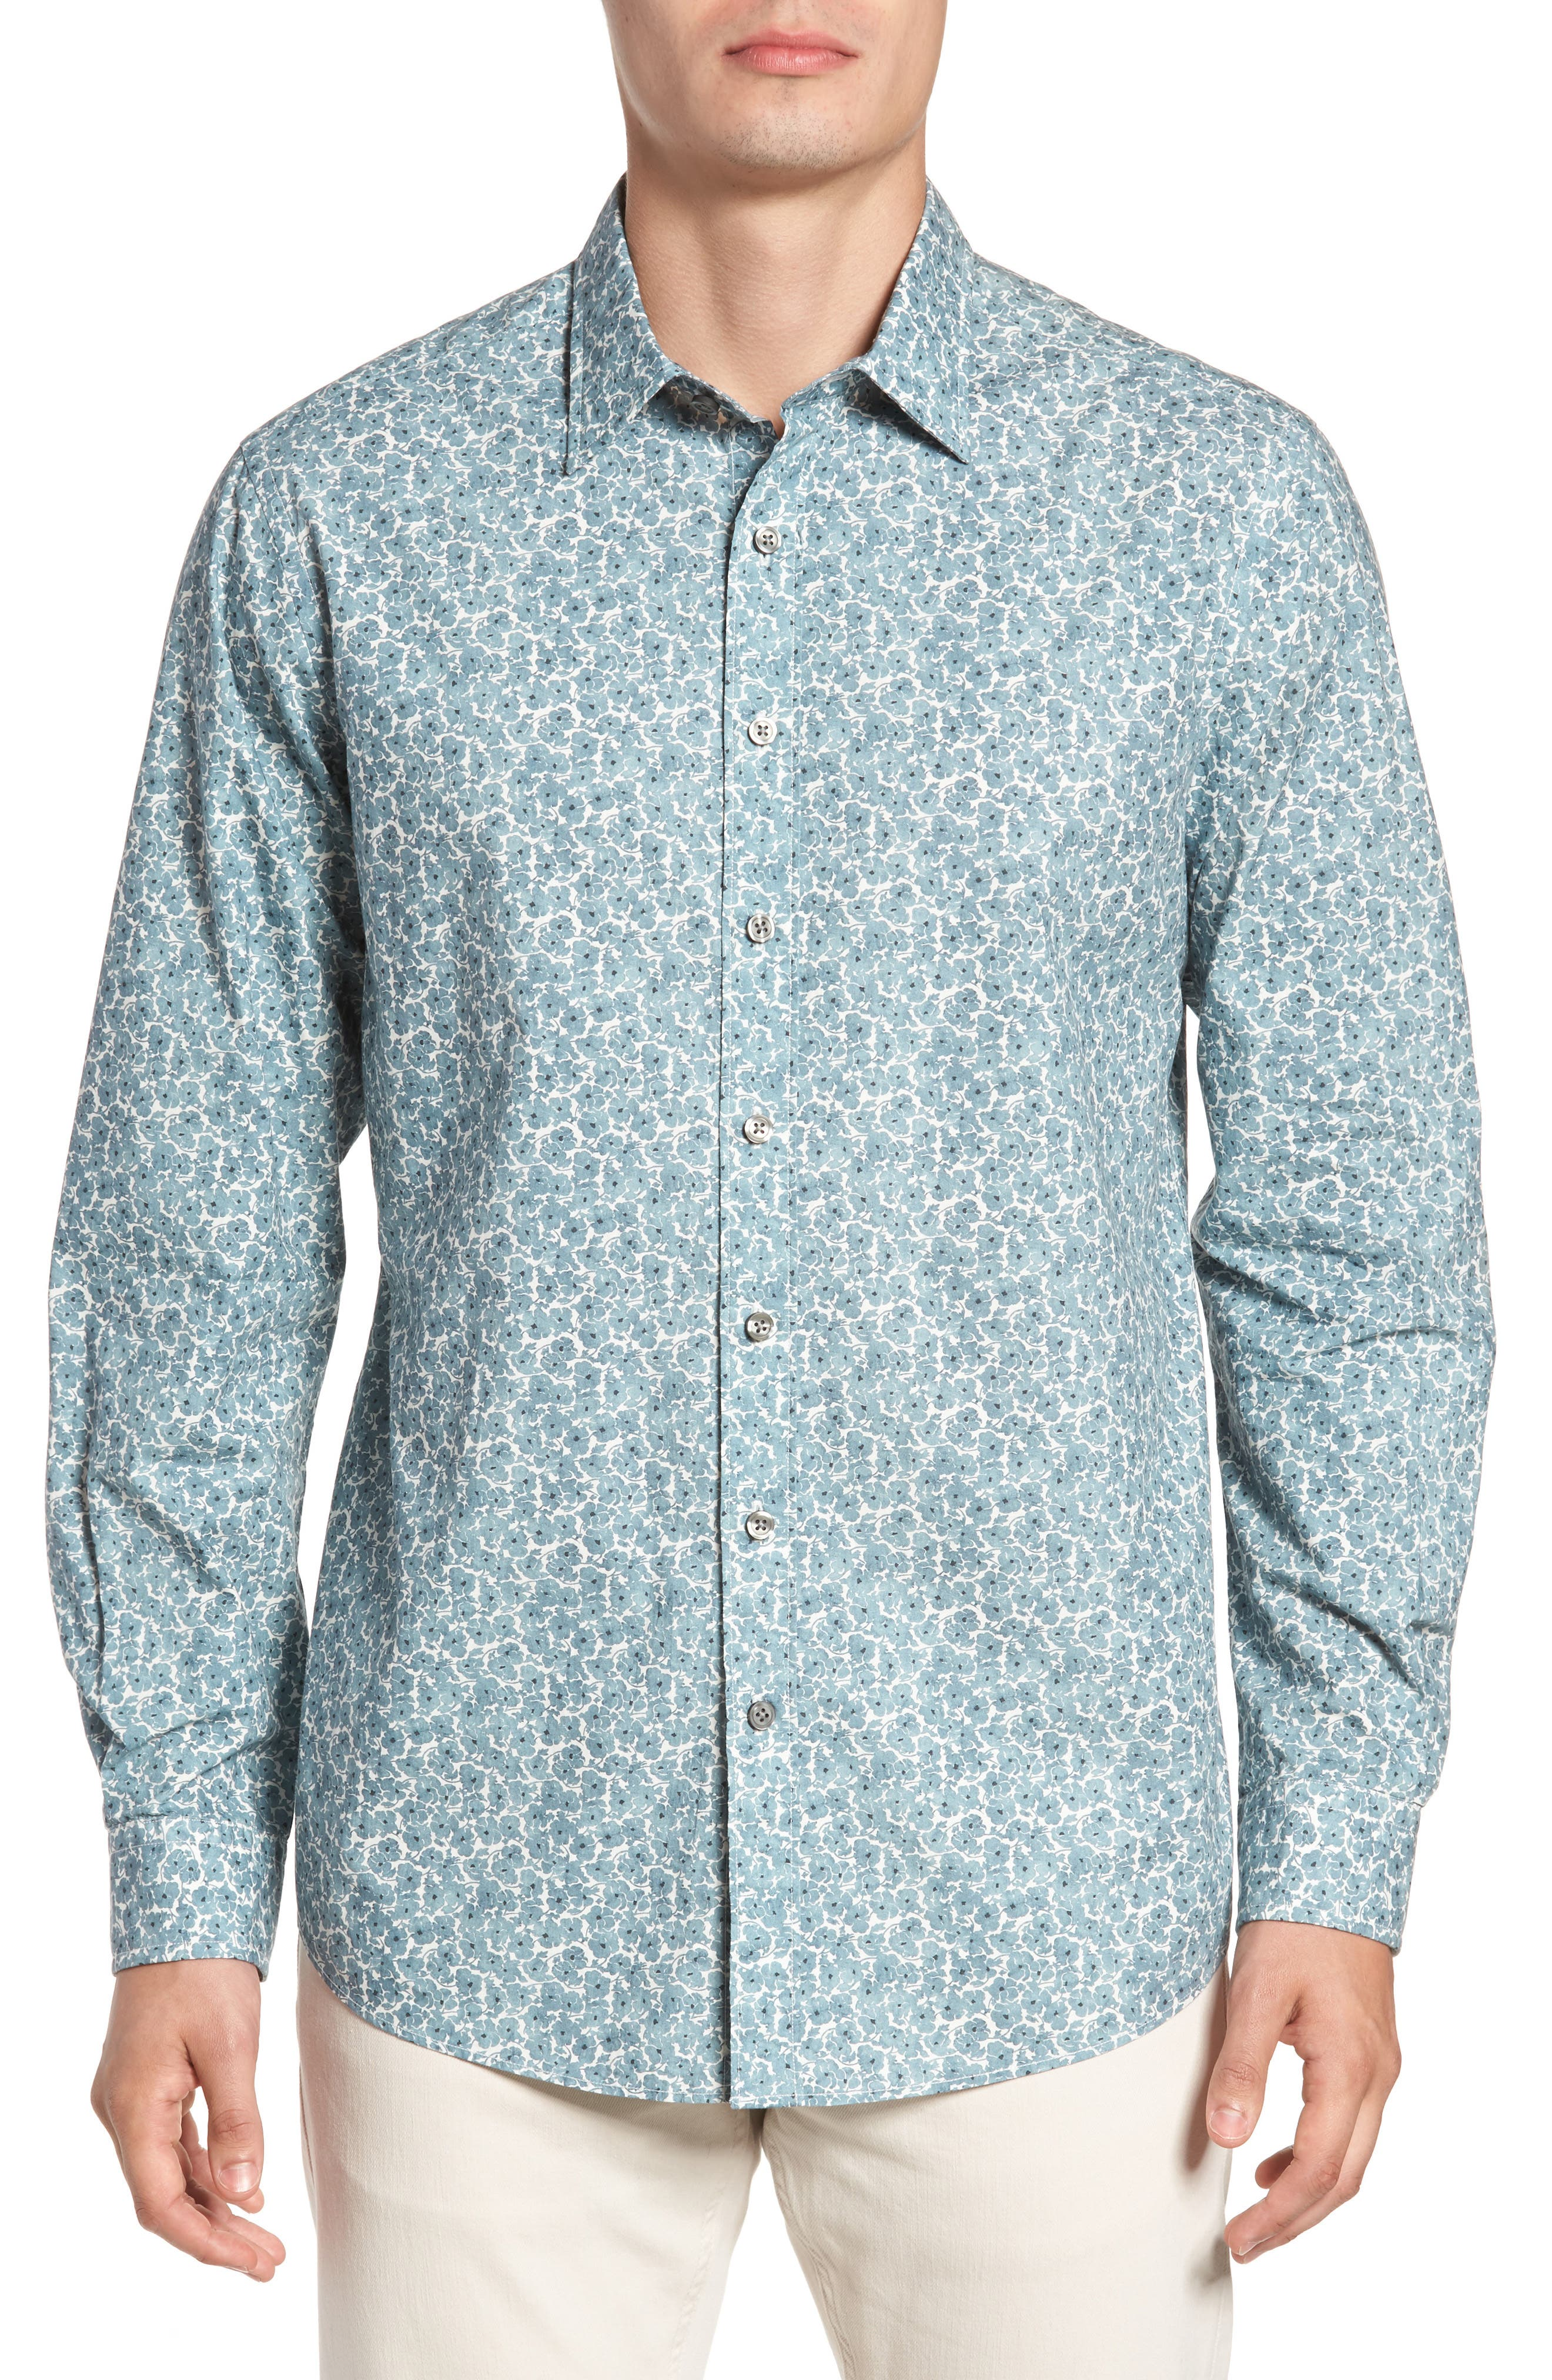 Alternate Image 1 Selected - Rodd & Gunn Mount Whitcombe Original Fit Sport Shirt